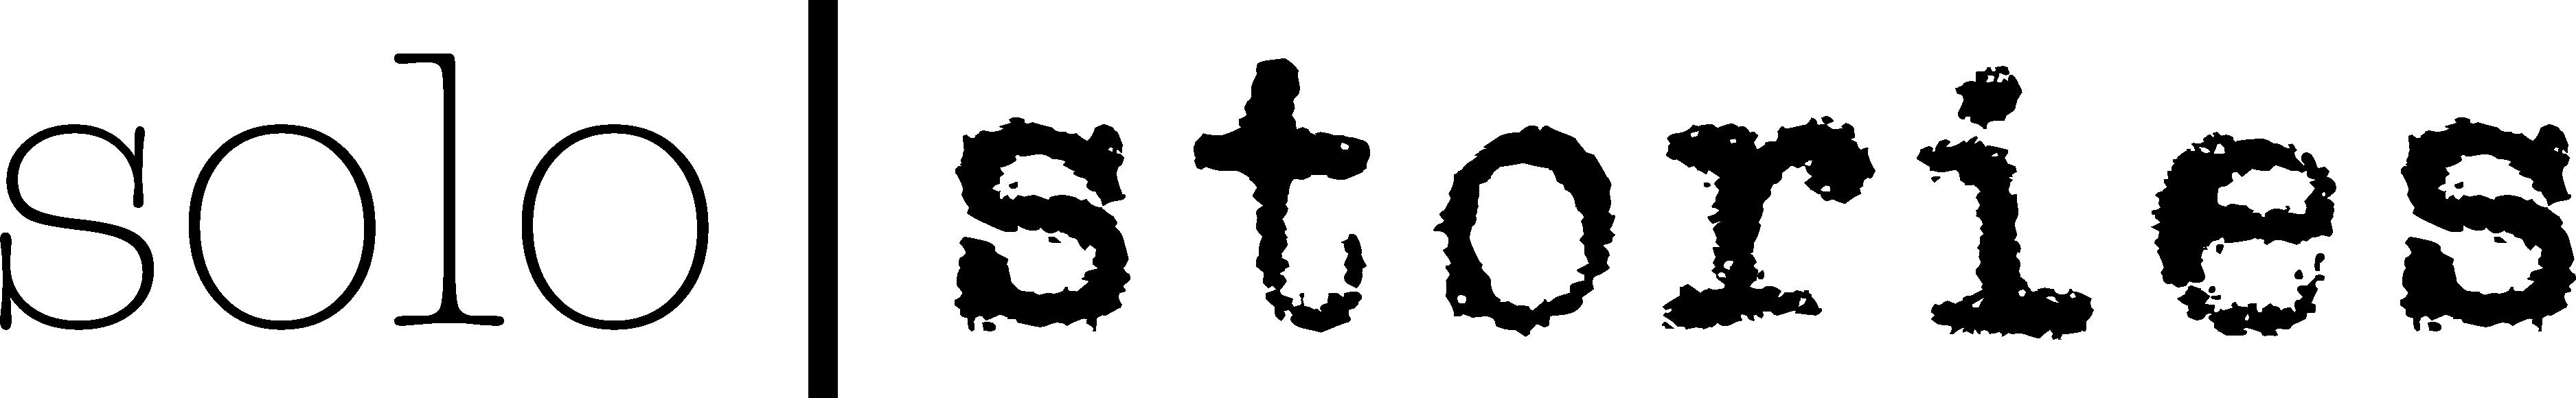 Solo Stories logo